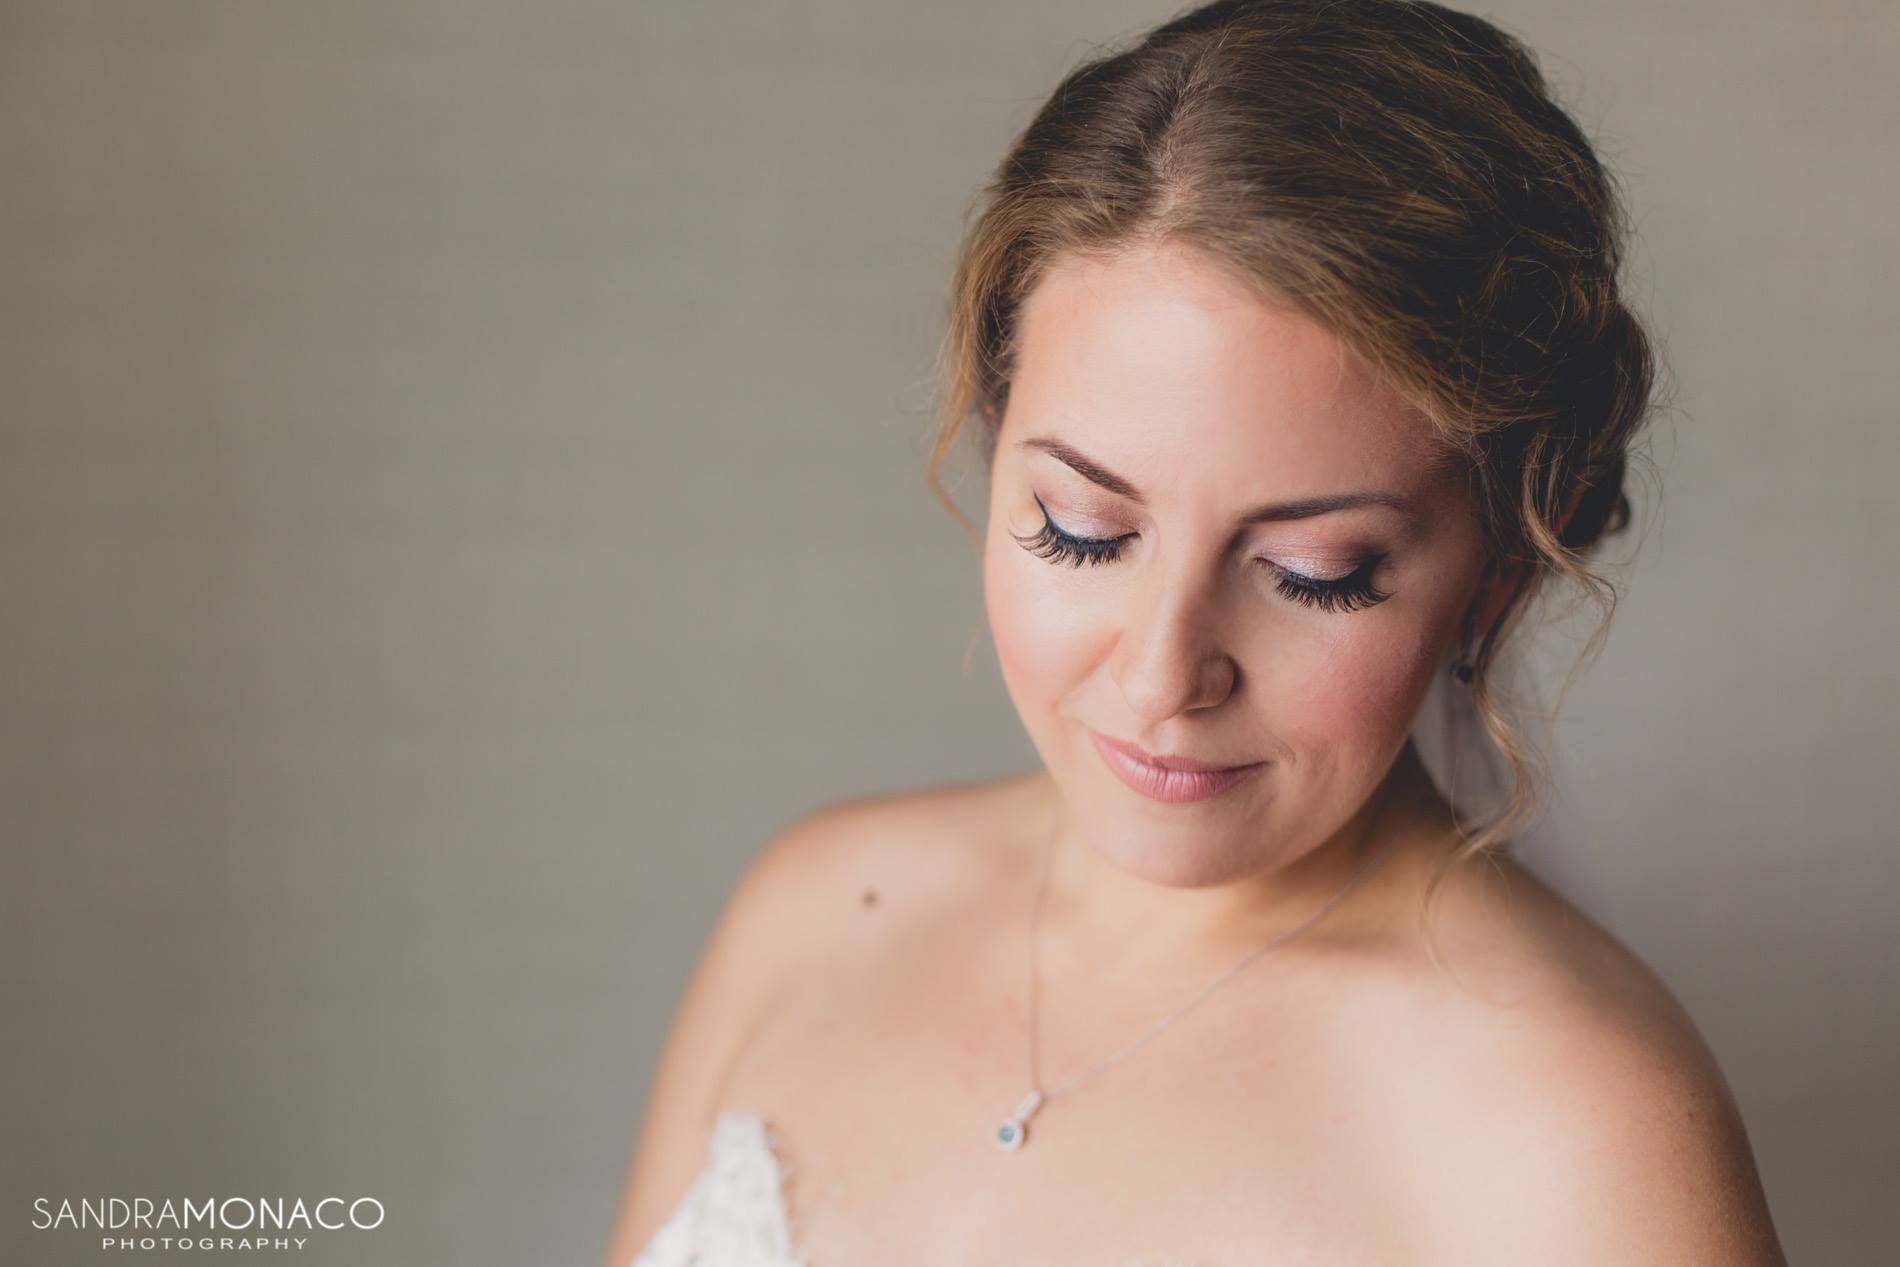 Sandra Monaco Photography